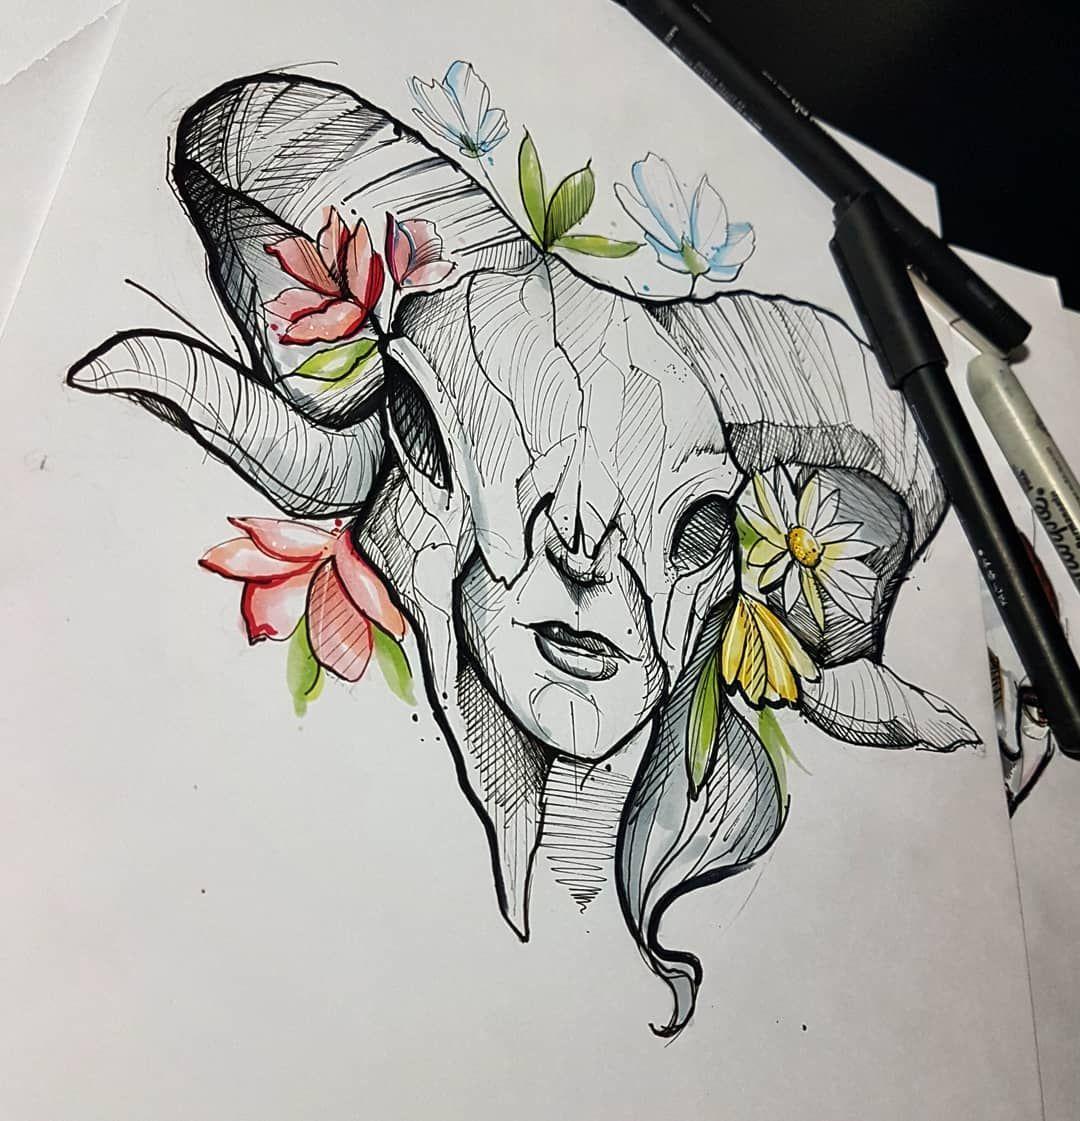 Skullady Tattoo Capricornio Sketch Art Copic Copicmarkers Painting Watercolorpainting Tatuagem Ta Tatuajes Capricornio Tatto Capricornio Capricornio